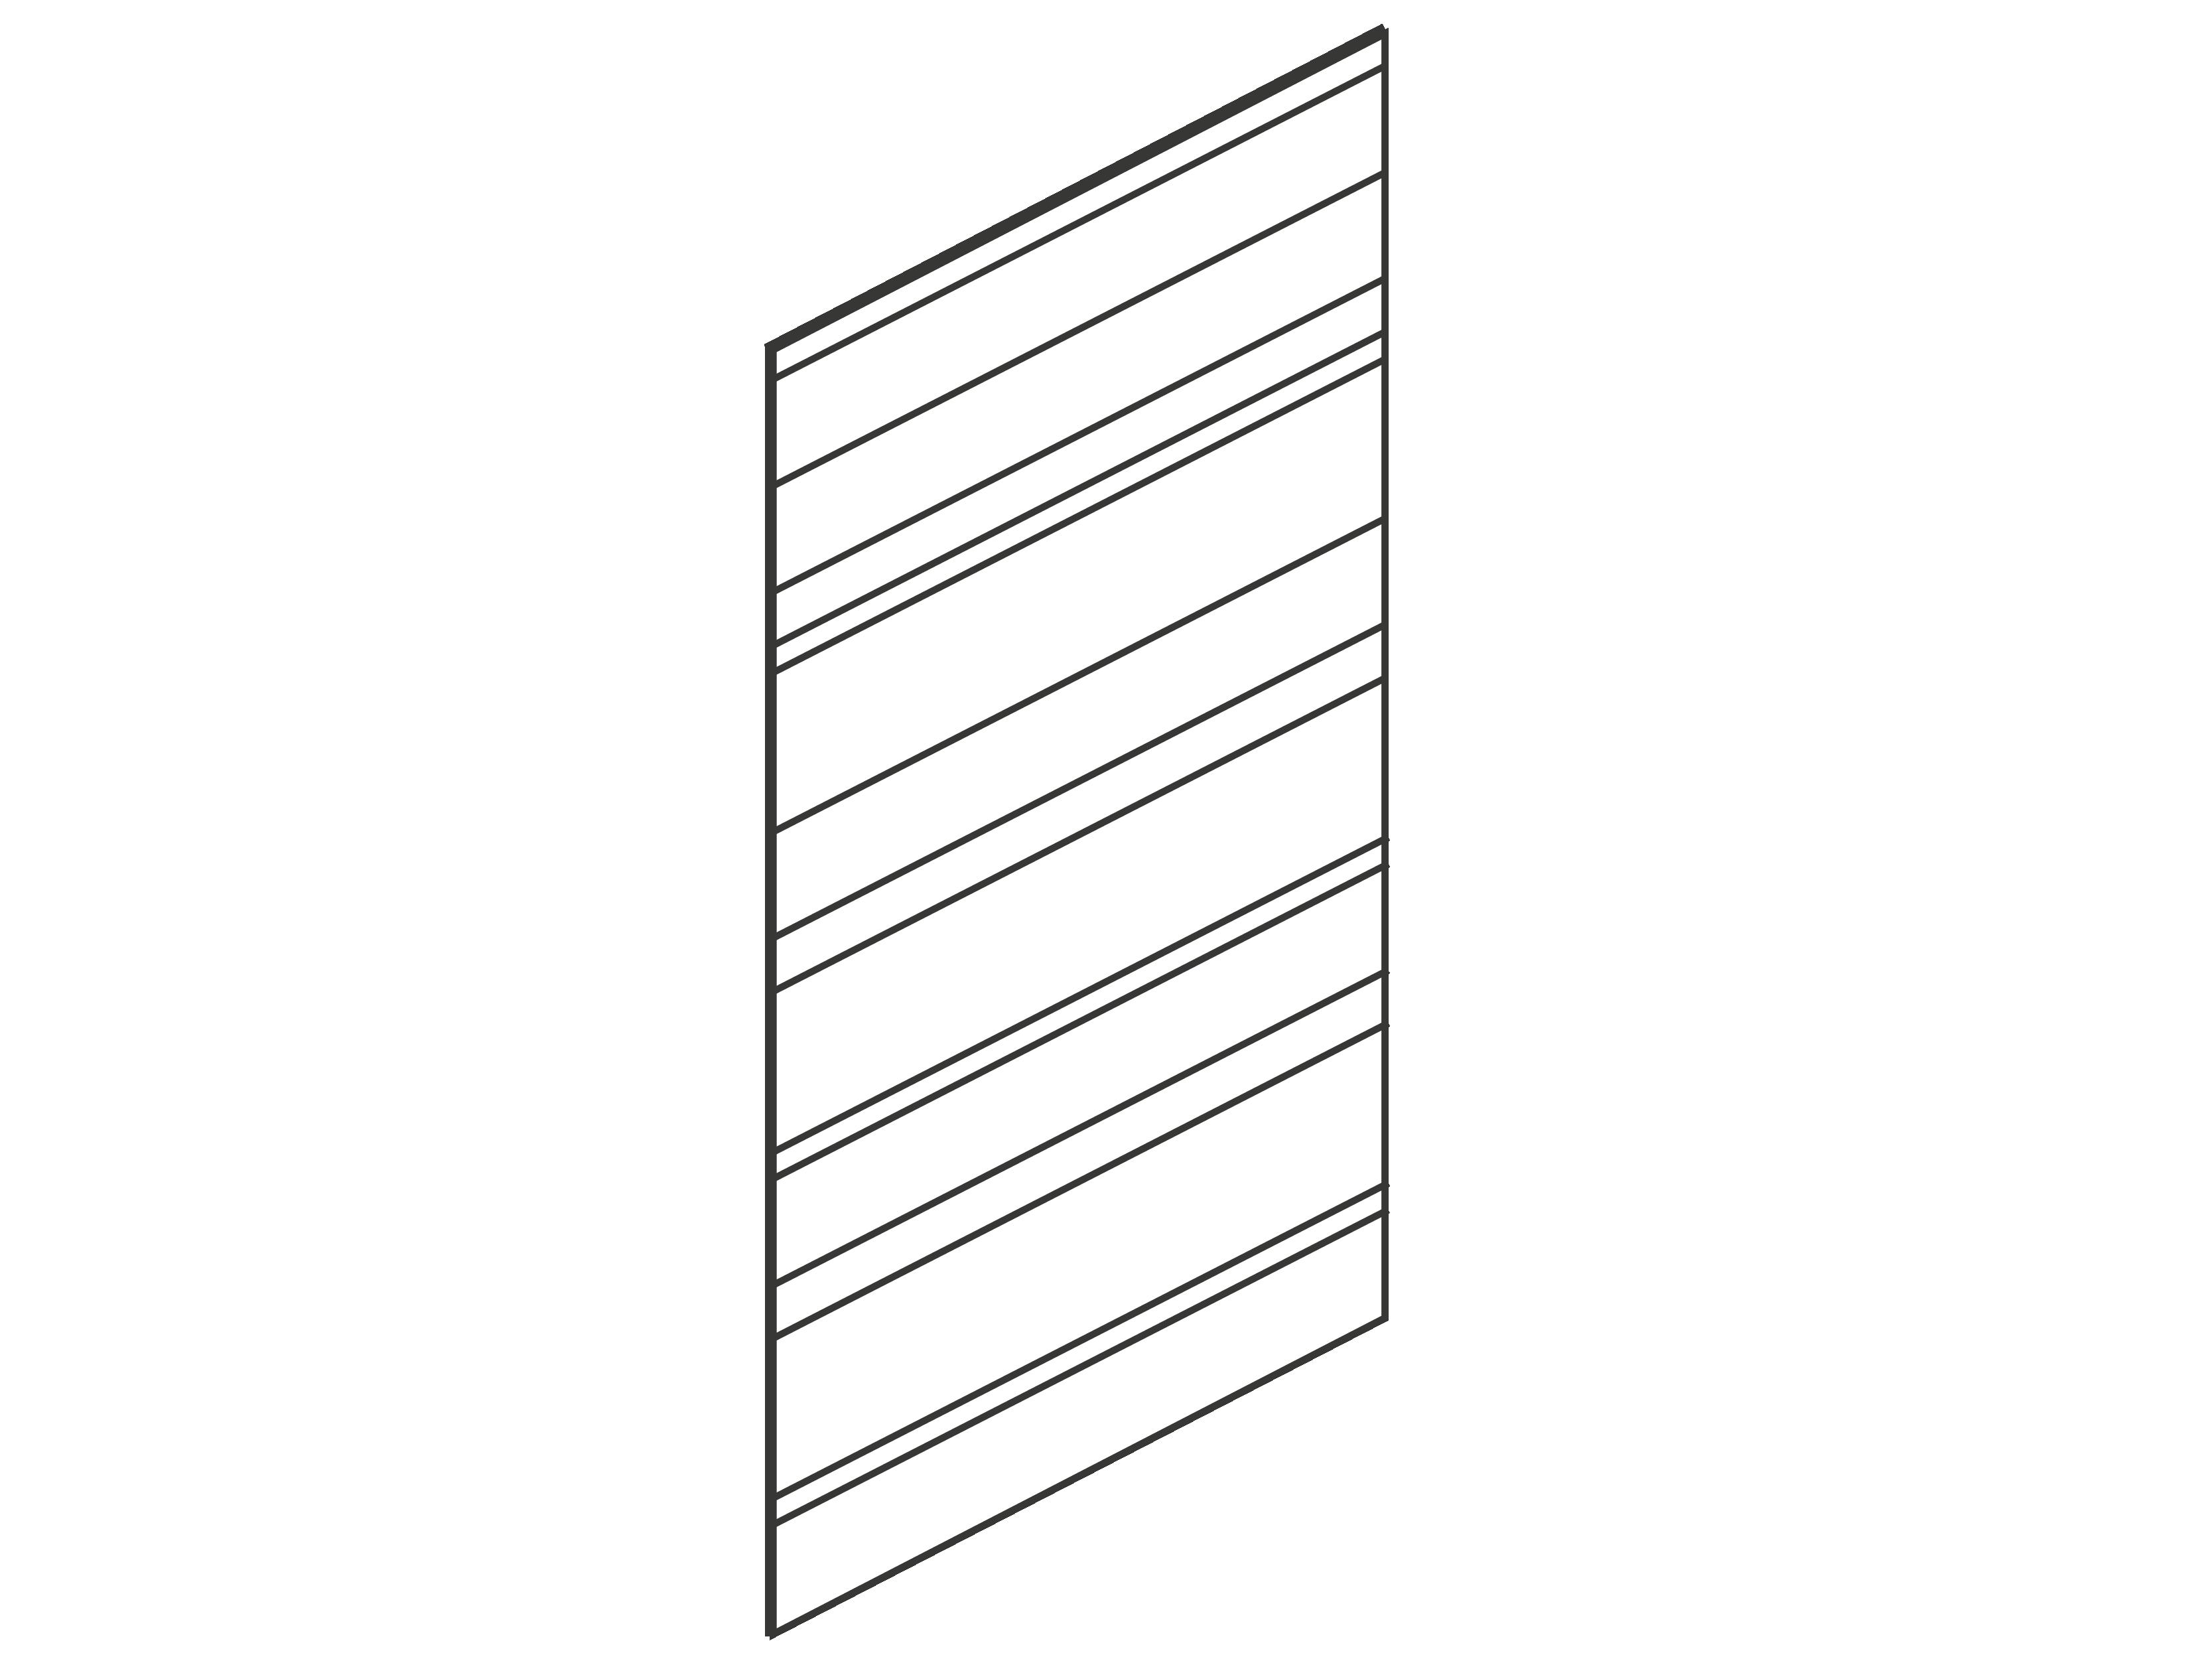 PANEL DECOR